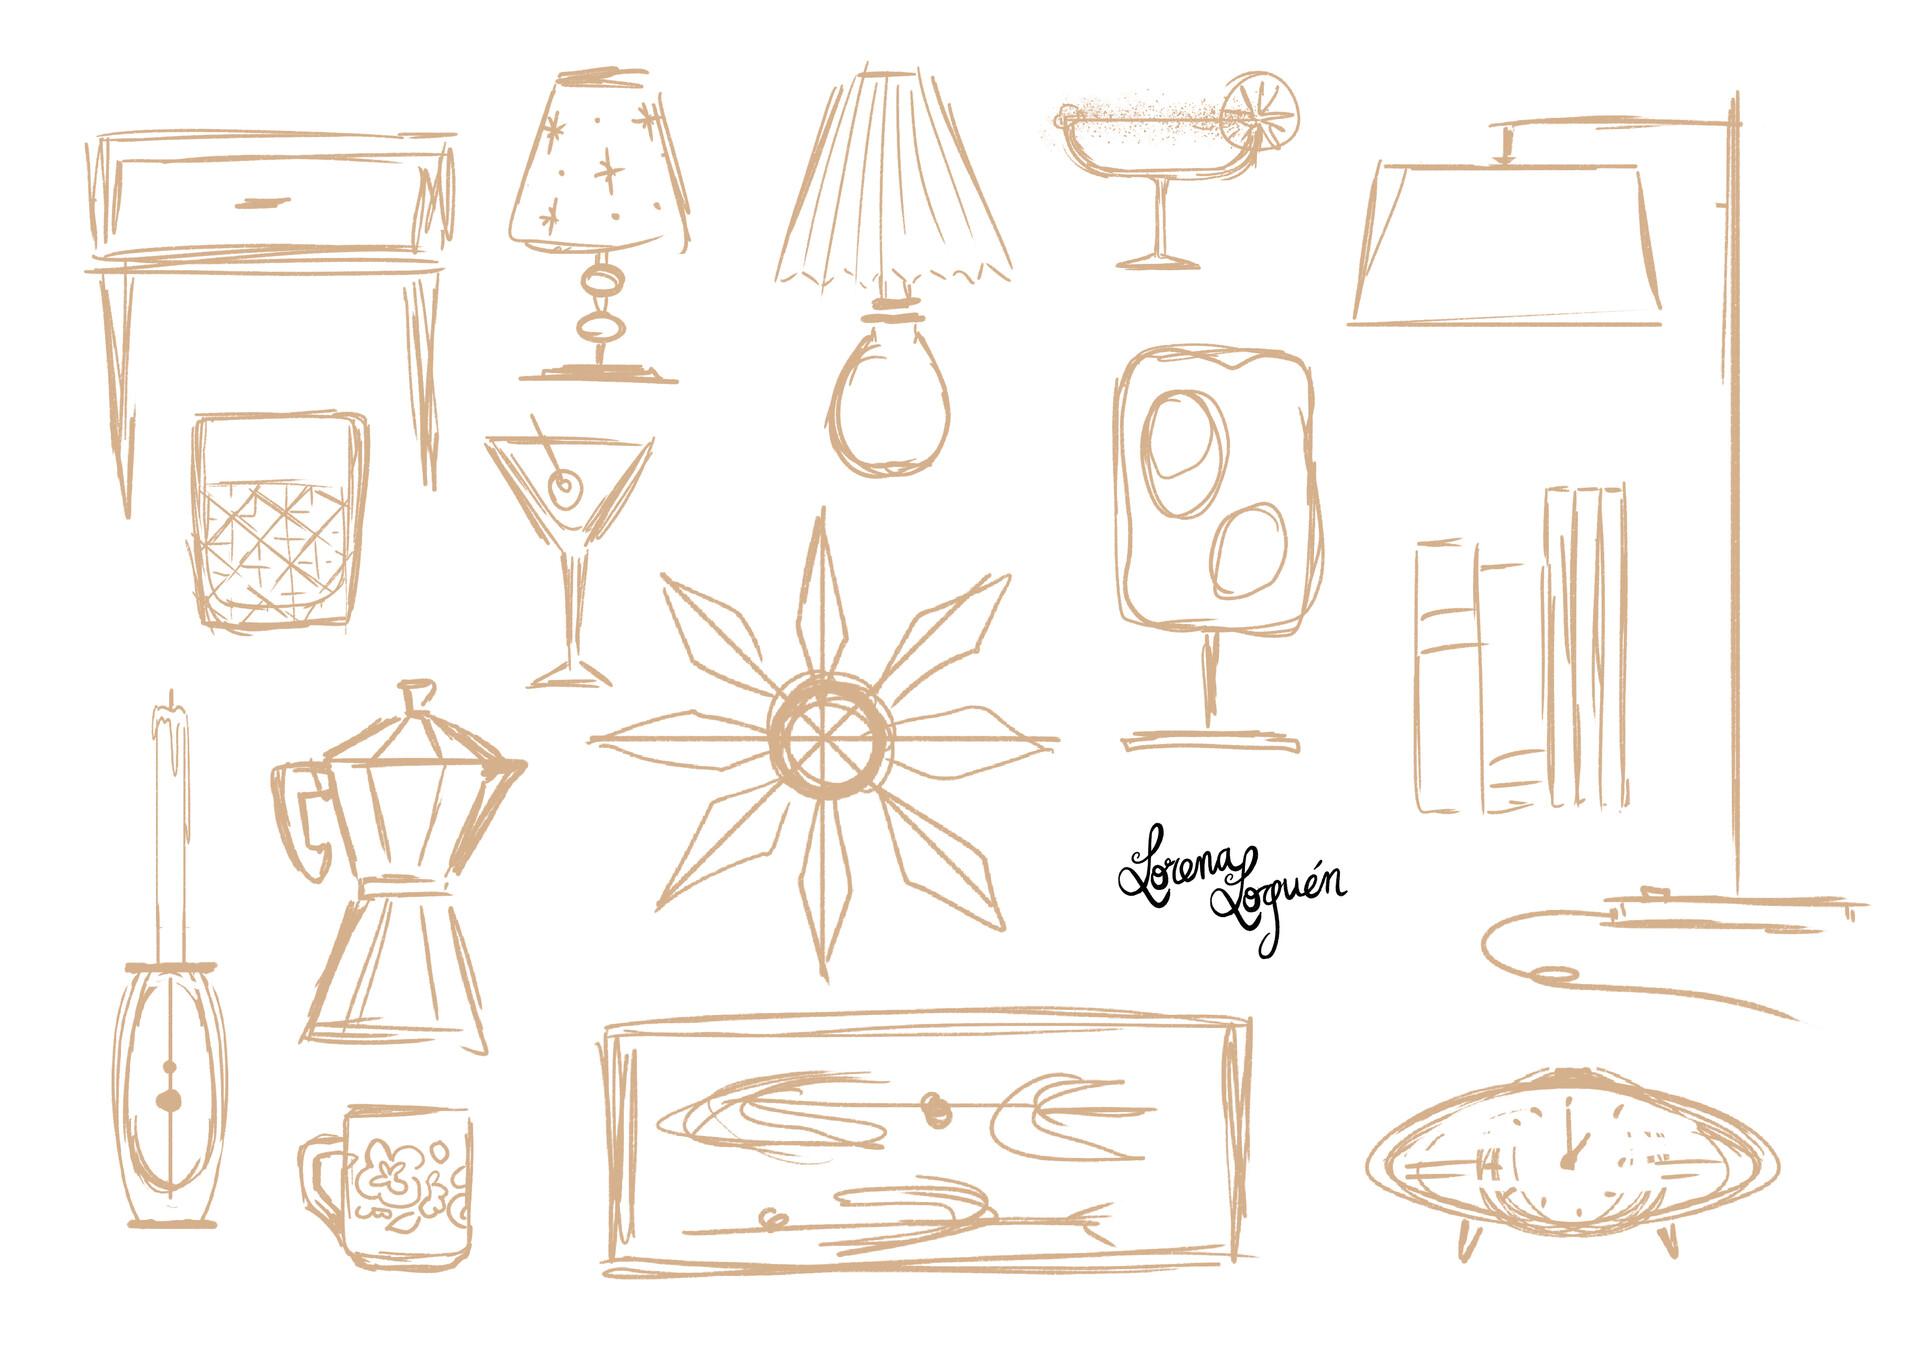 Lorena loguen mid century props sketch by lorena loguen